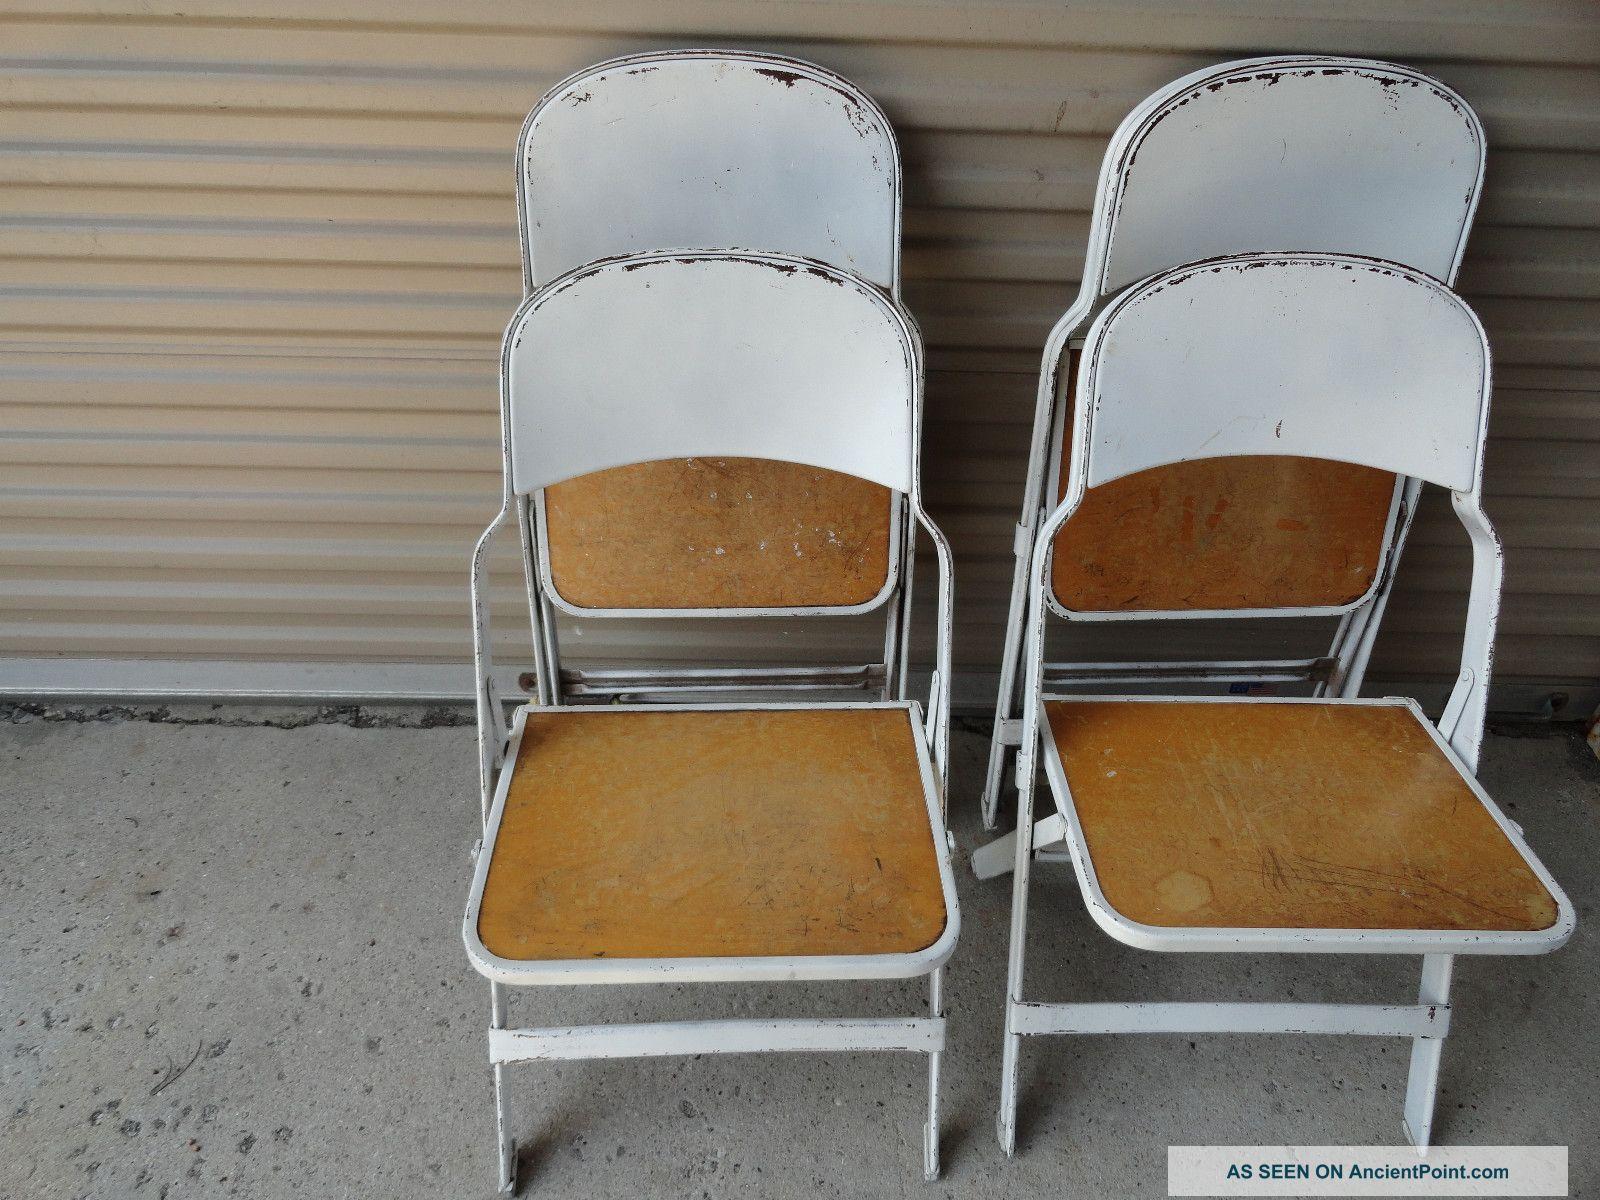 Vintage - Metal/wood Folding Chairs Post-1950 photo